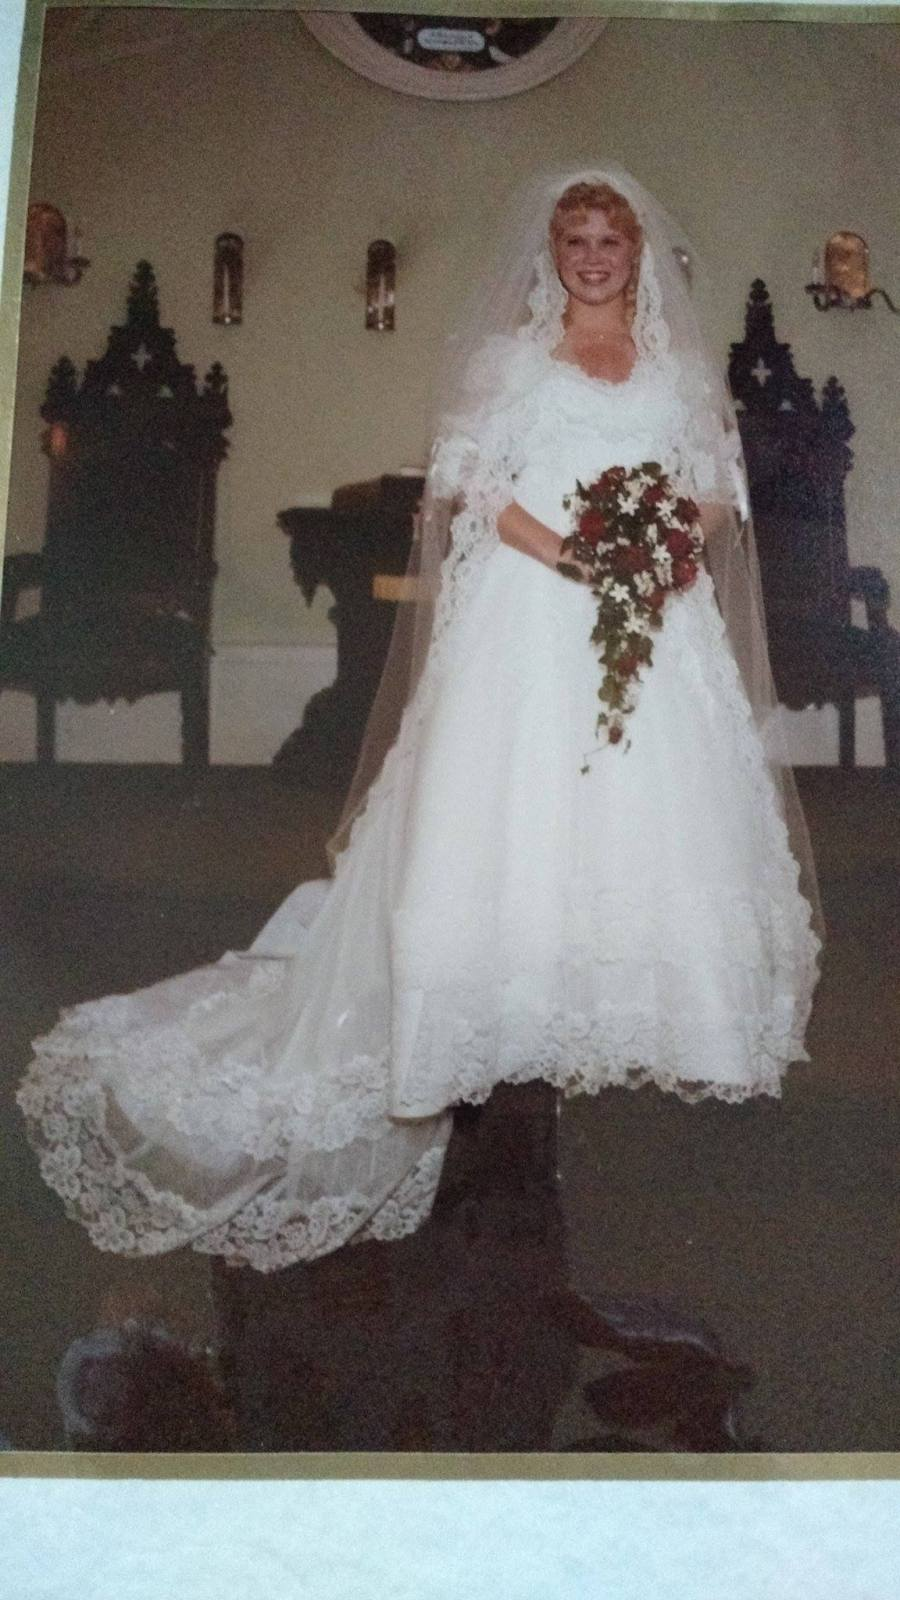 October 20, 1984 - after ceremony - Breakabeen, New York